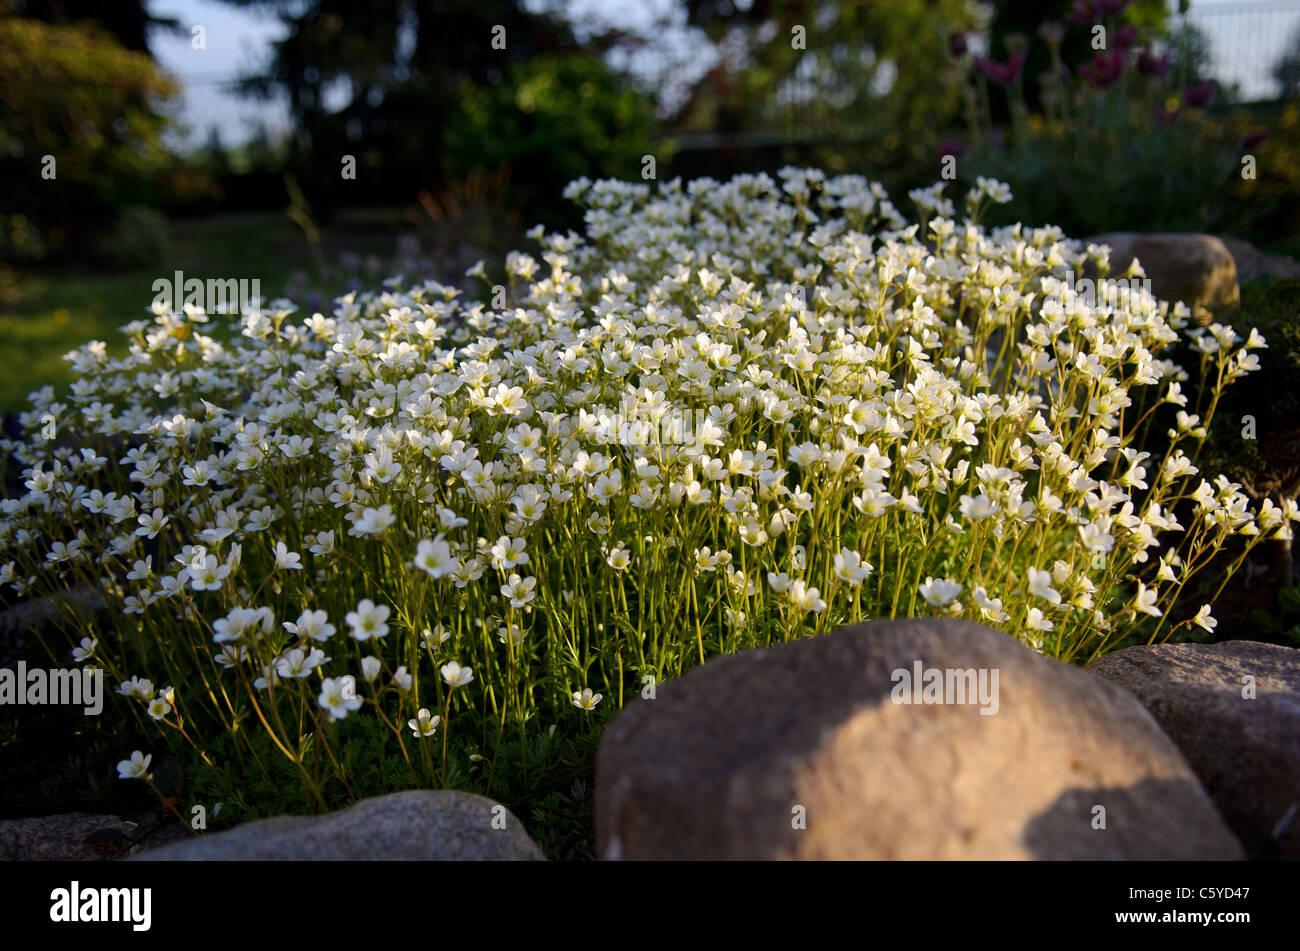 Bunch of small white flowers on a rockery stock photo 38097031 alamy bunch of small white flowers on a rockery izmirmasajfo